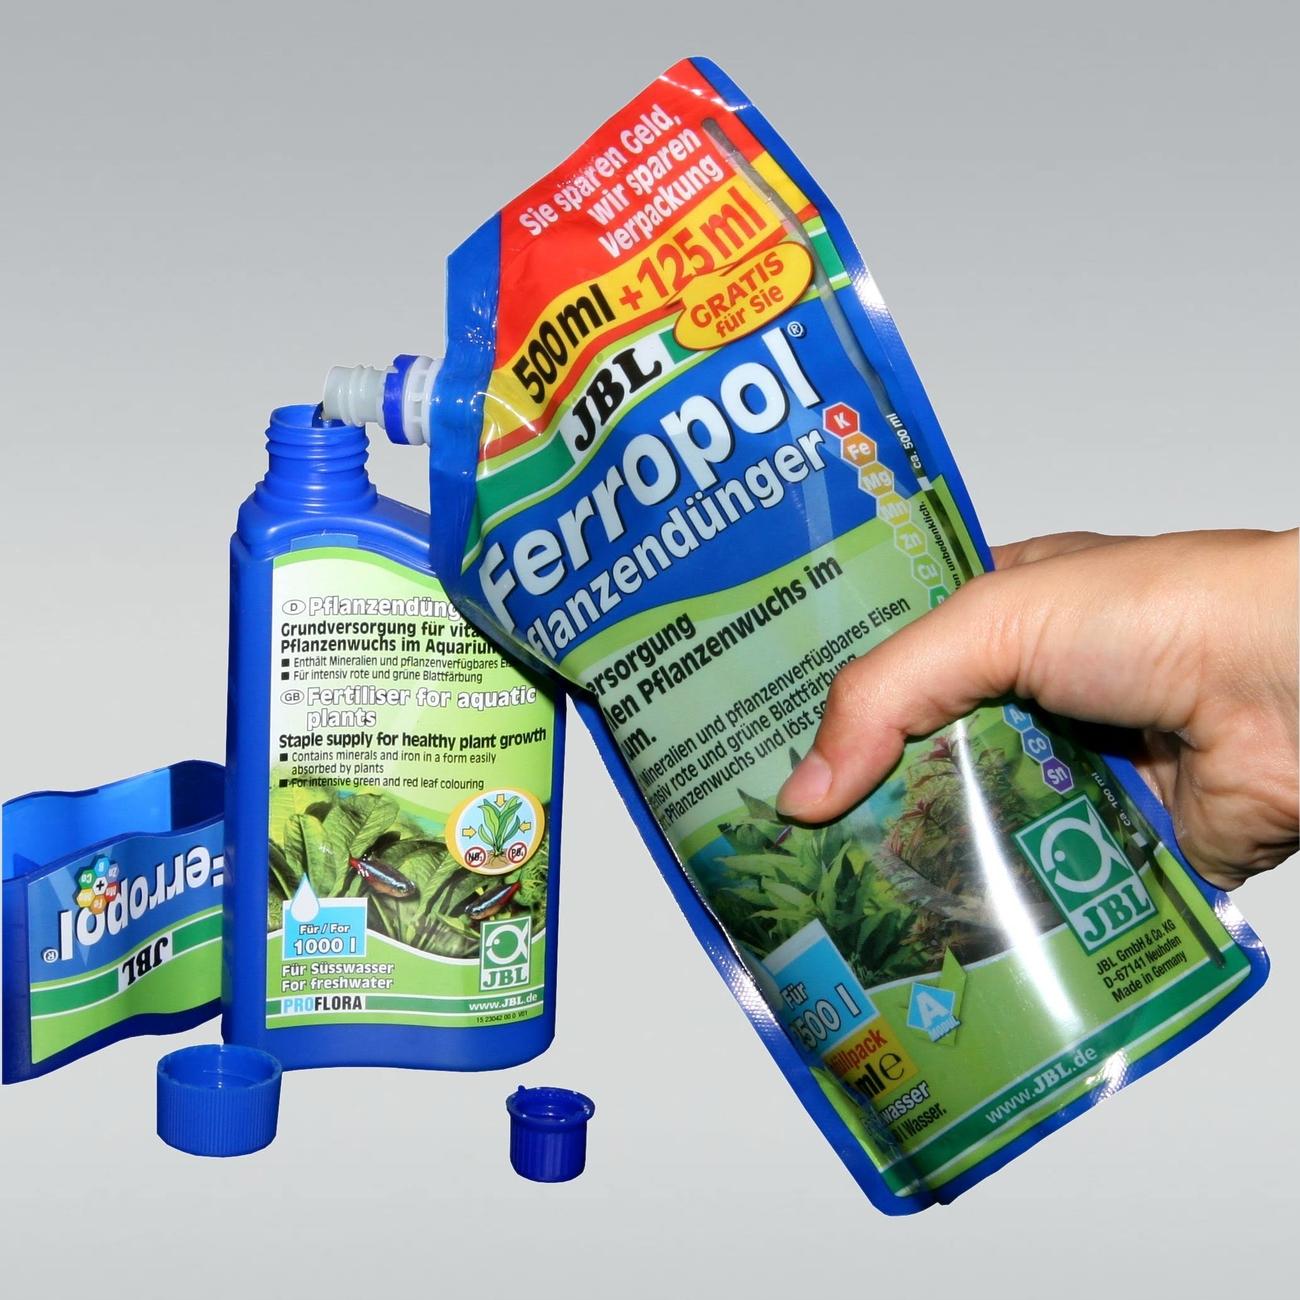 JBL Ferropol Pflanzendünger für Süßwasser-Aquarien, Bild 5